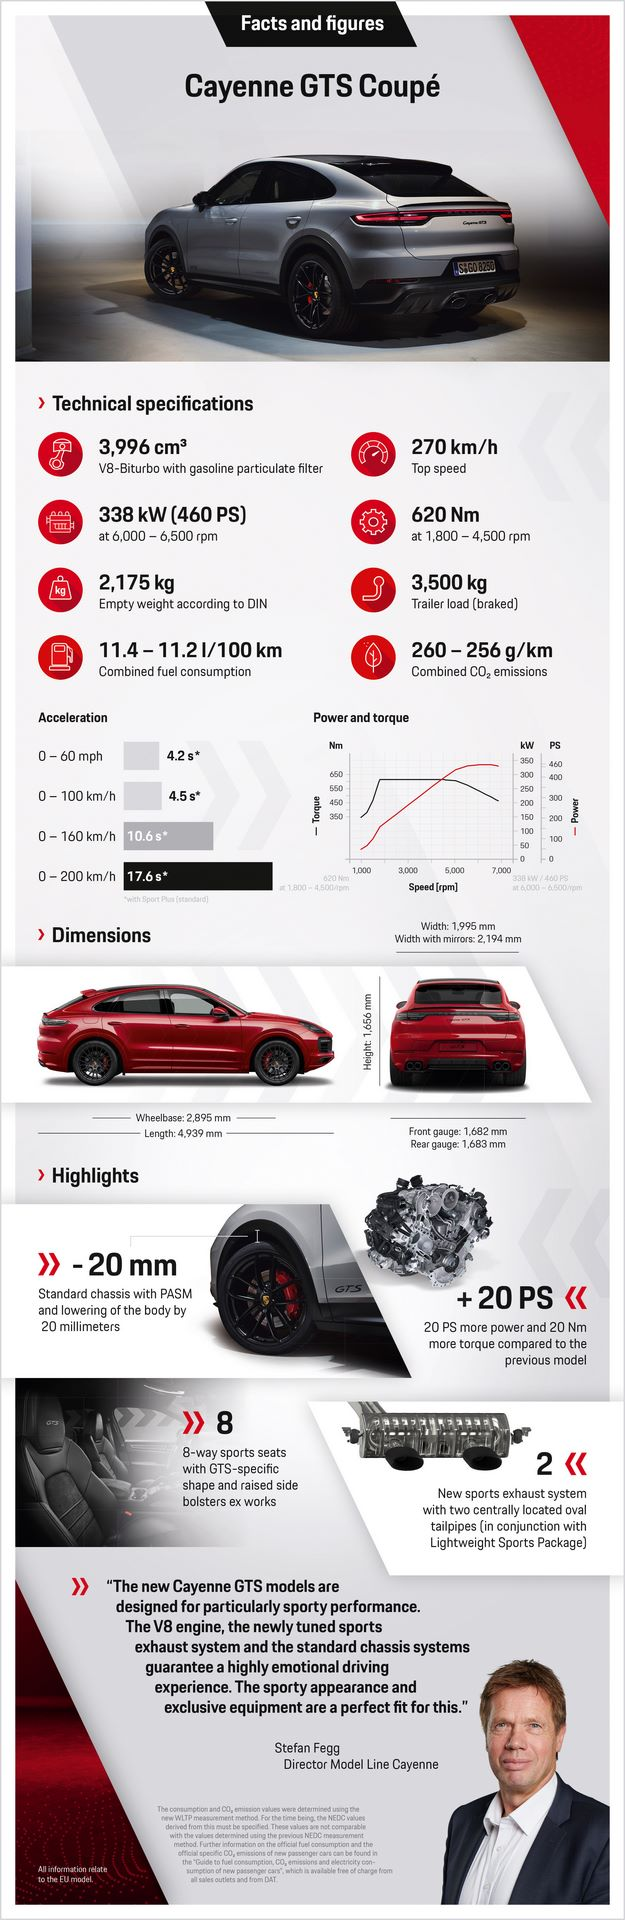 2020.06.03_PORSCHE_Infografik_Cayenne_GTS_Coupé_EN_v3.indd